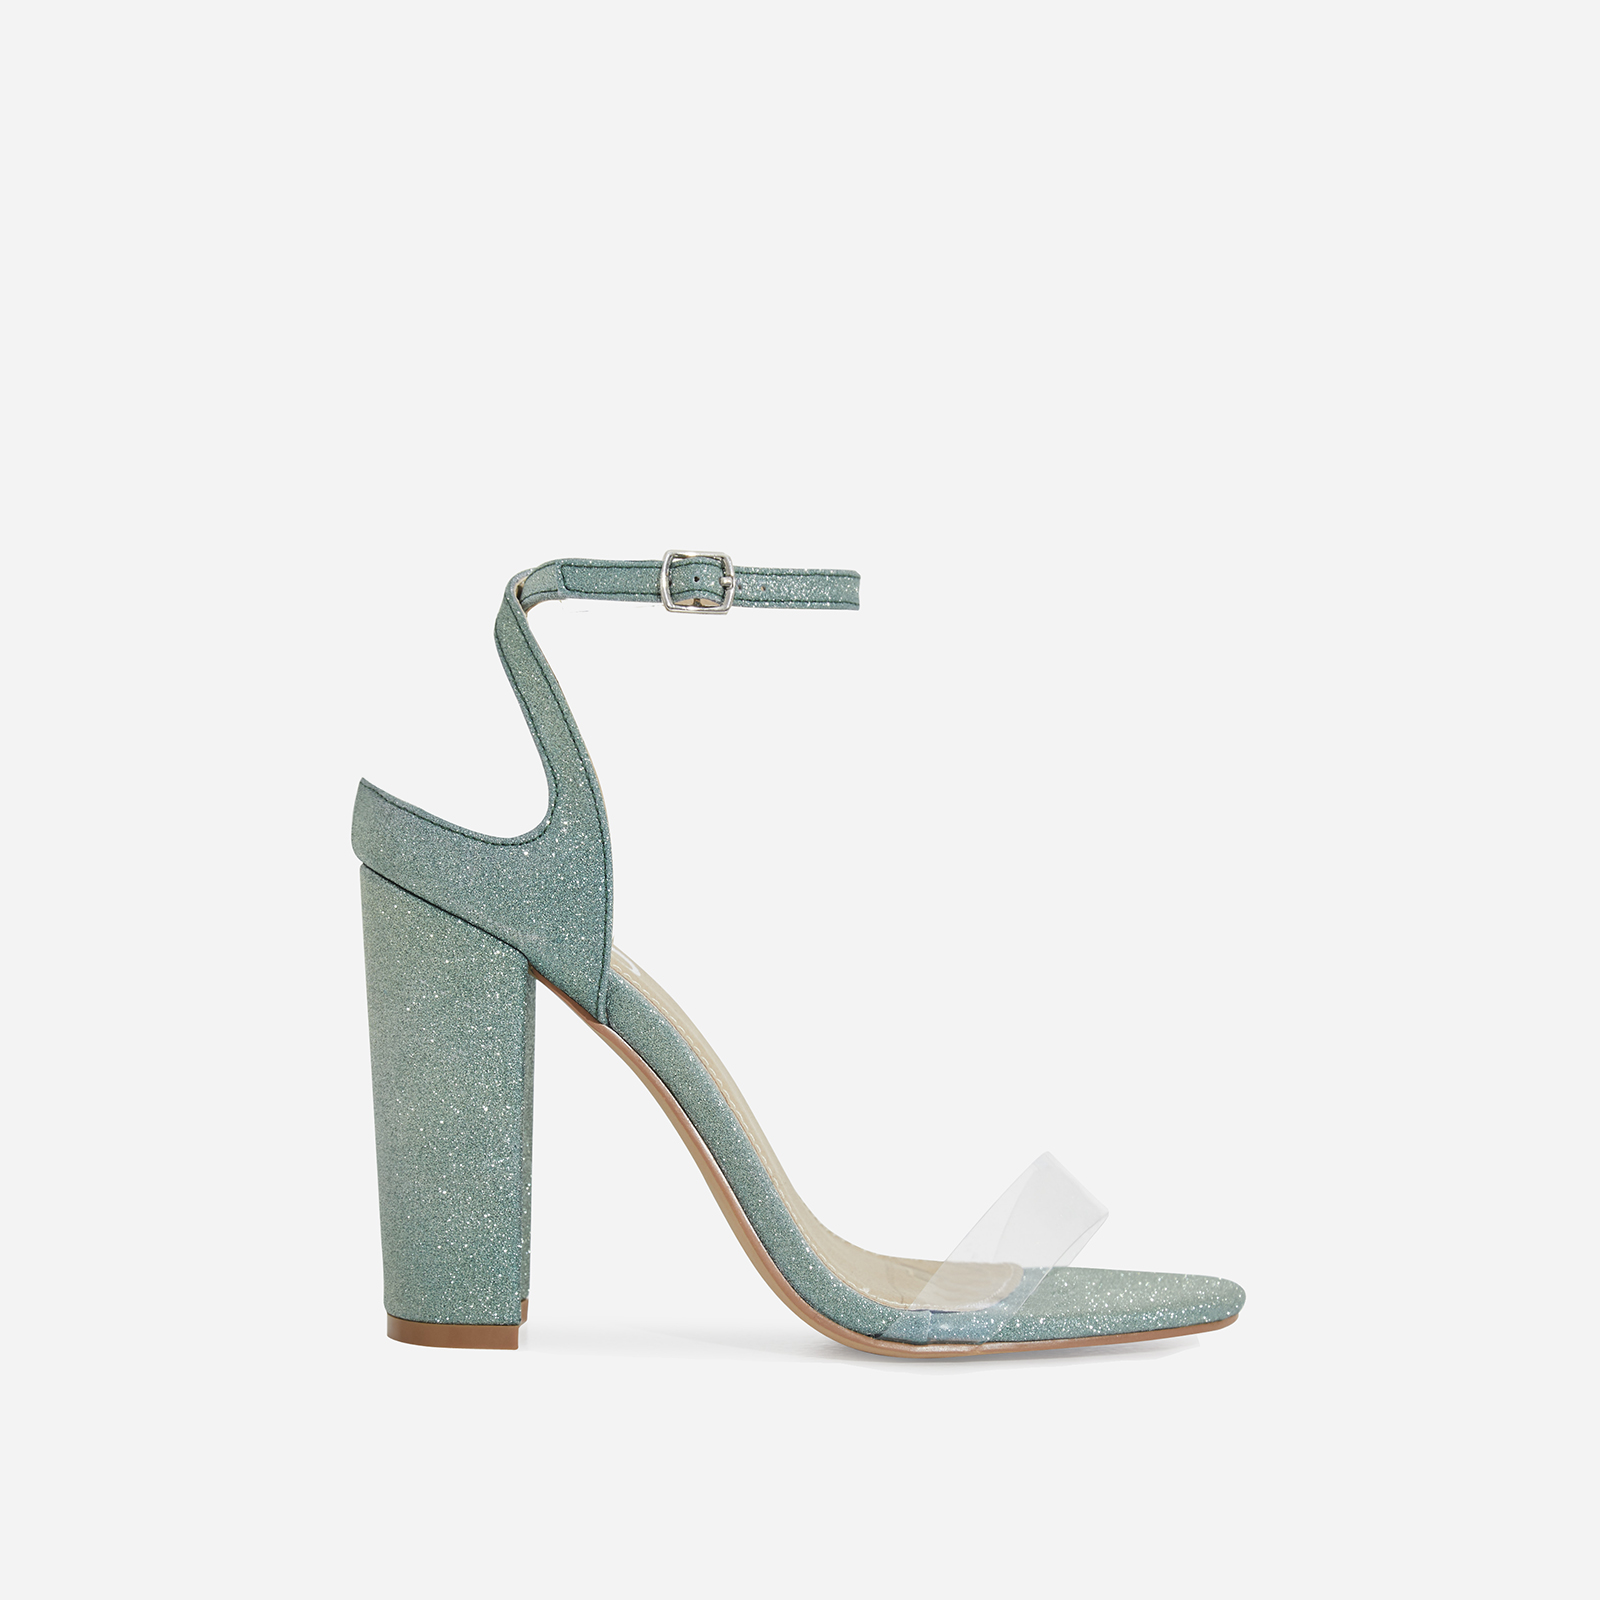 d047b45a483 Block Heels  Women s Block Heel Boots   Shoes - EGO Shoes